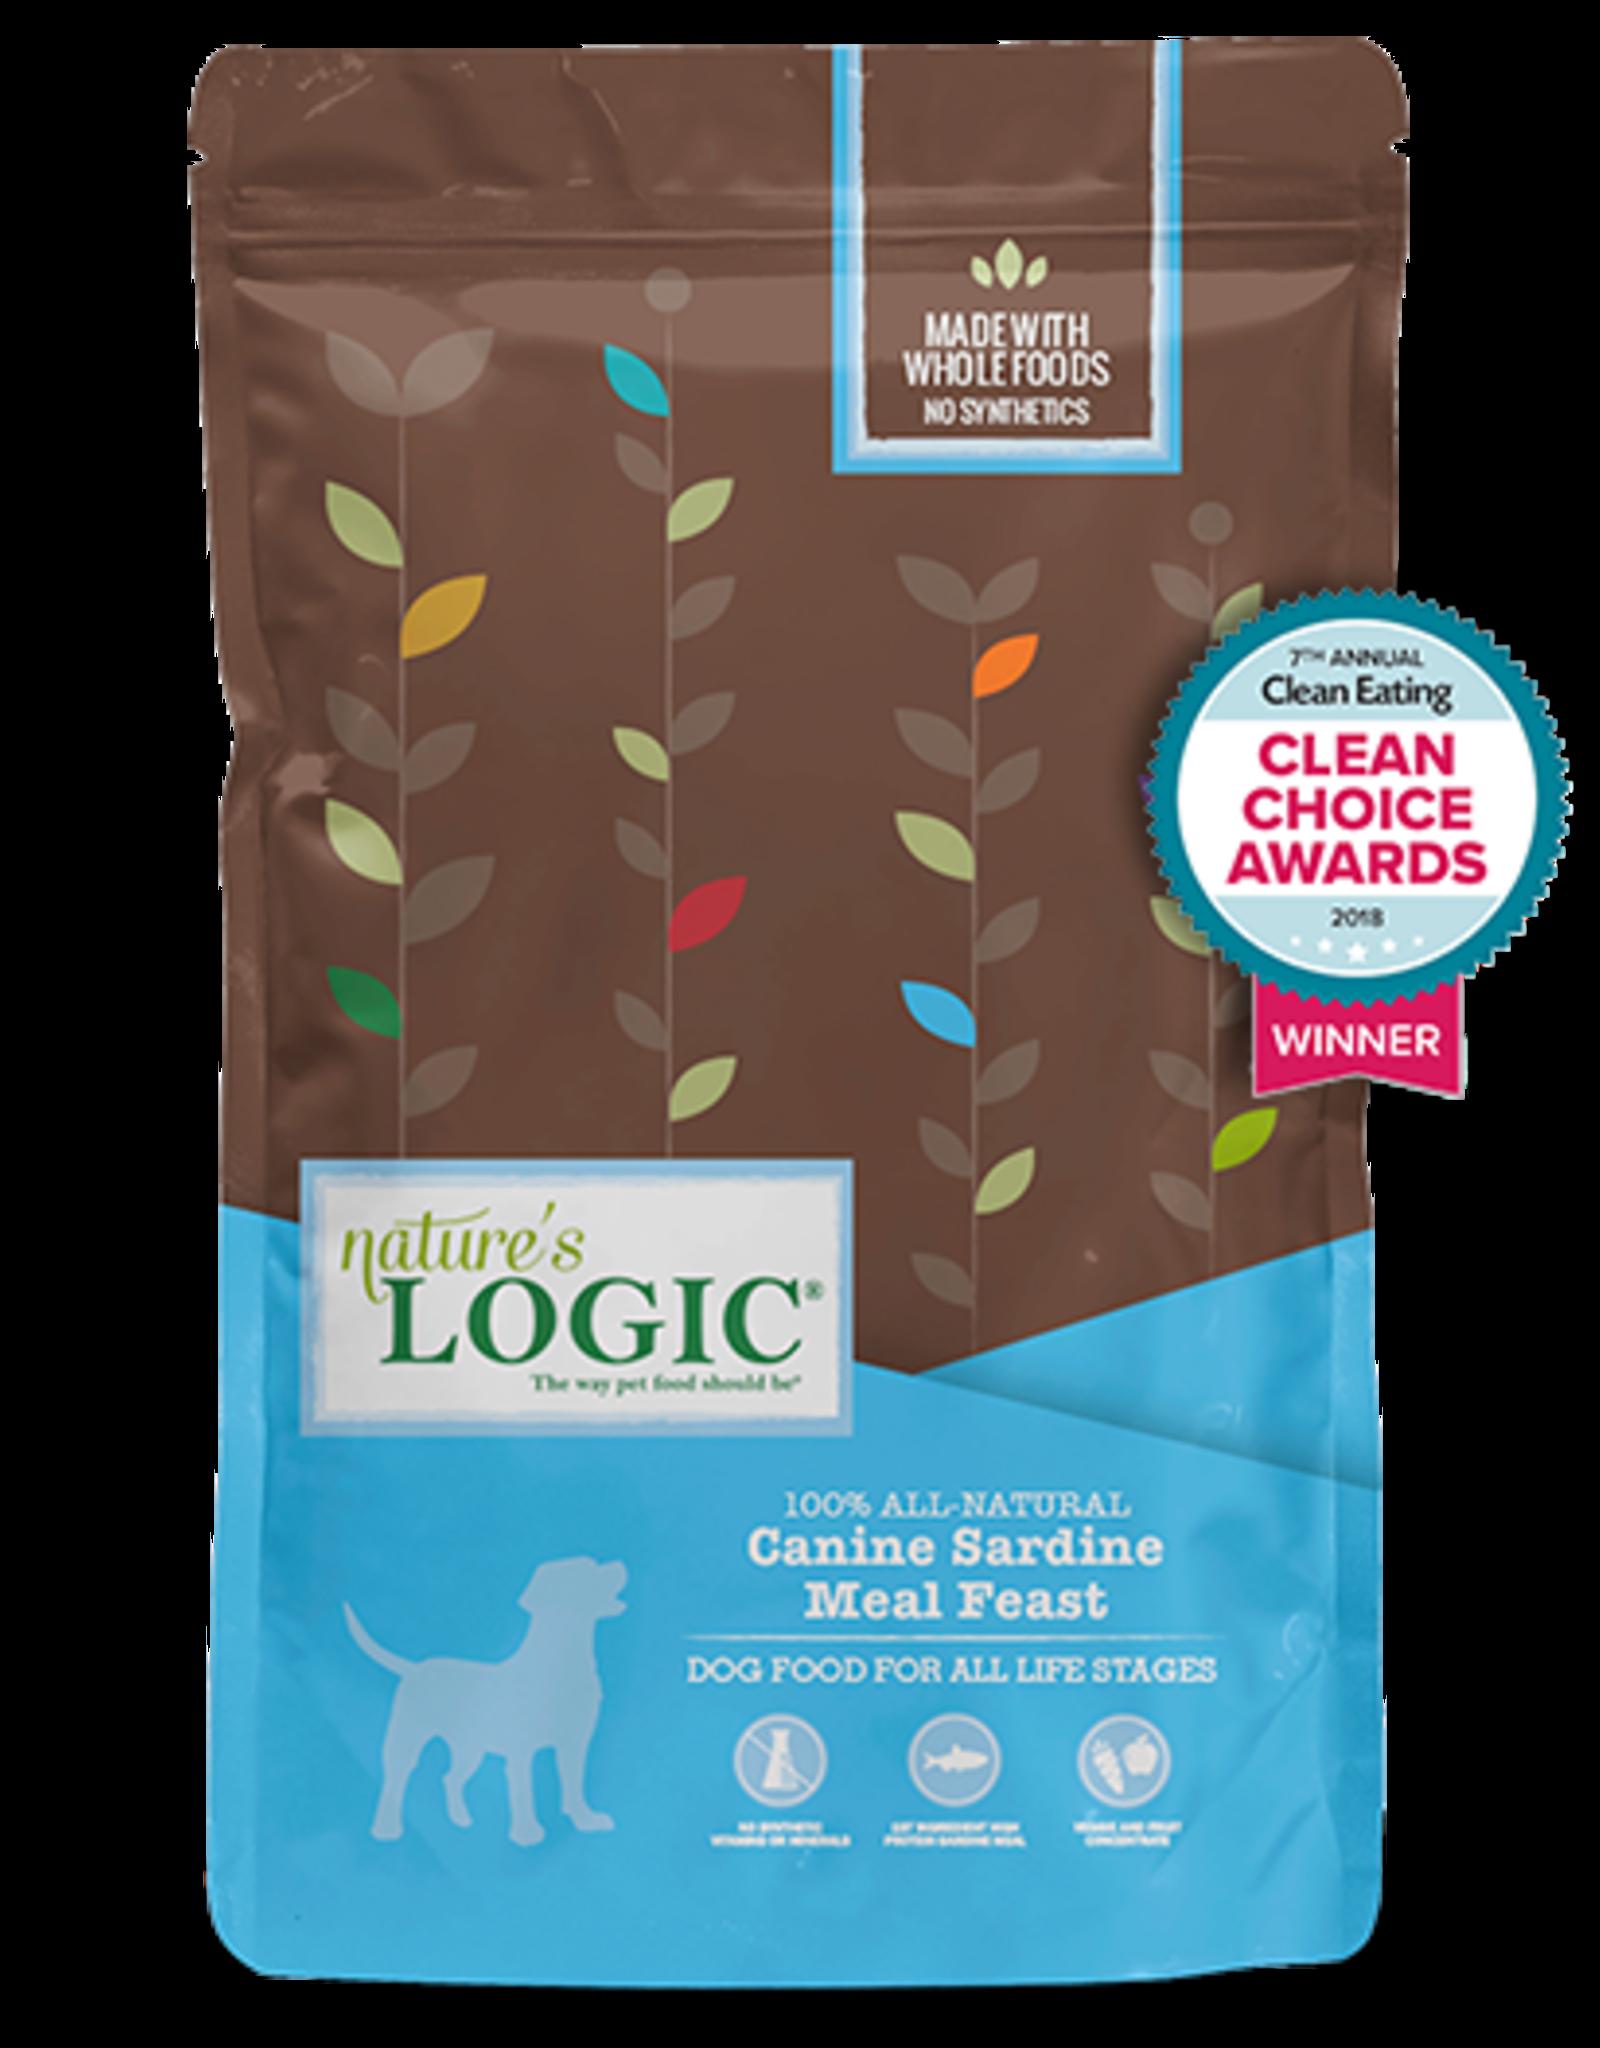 Nature's Logic Nature's Logic Dry Dog Food Original Sardine Meal Feast